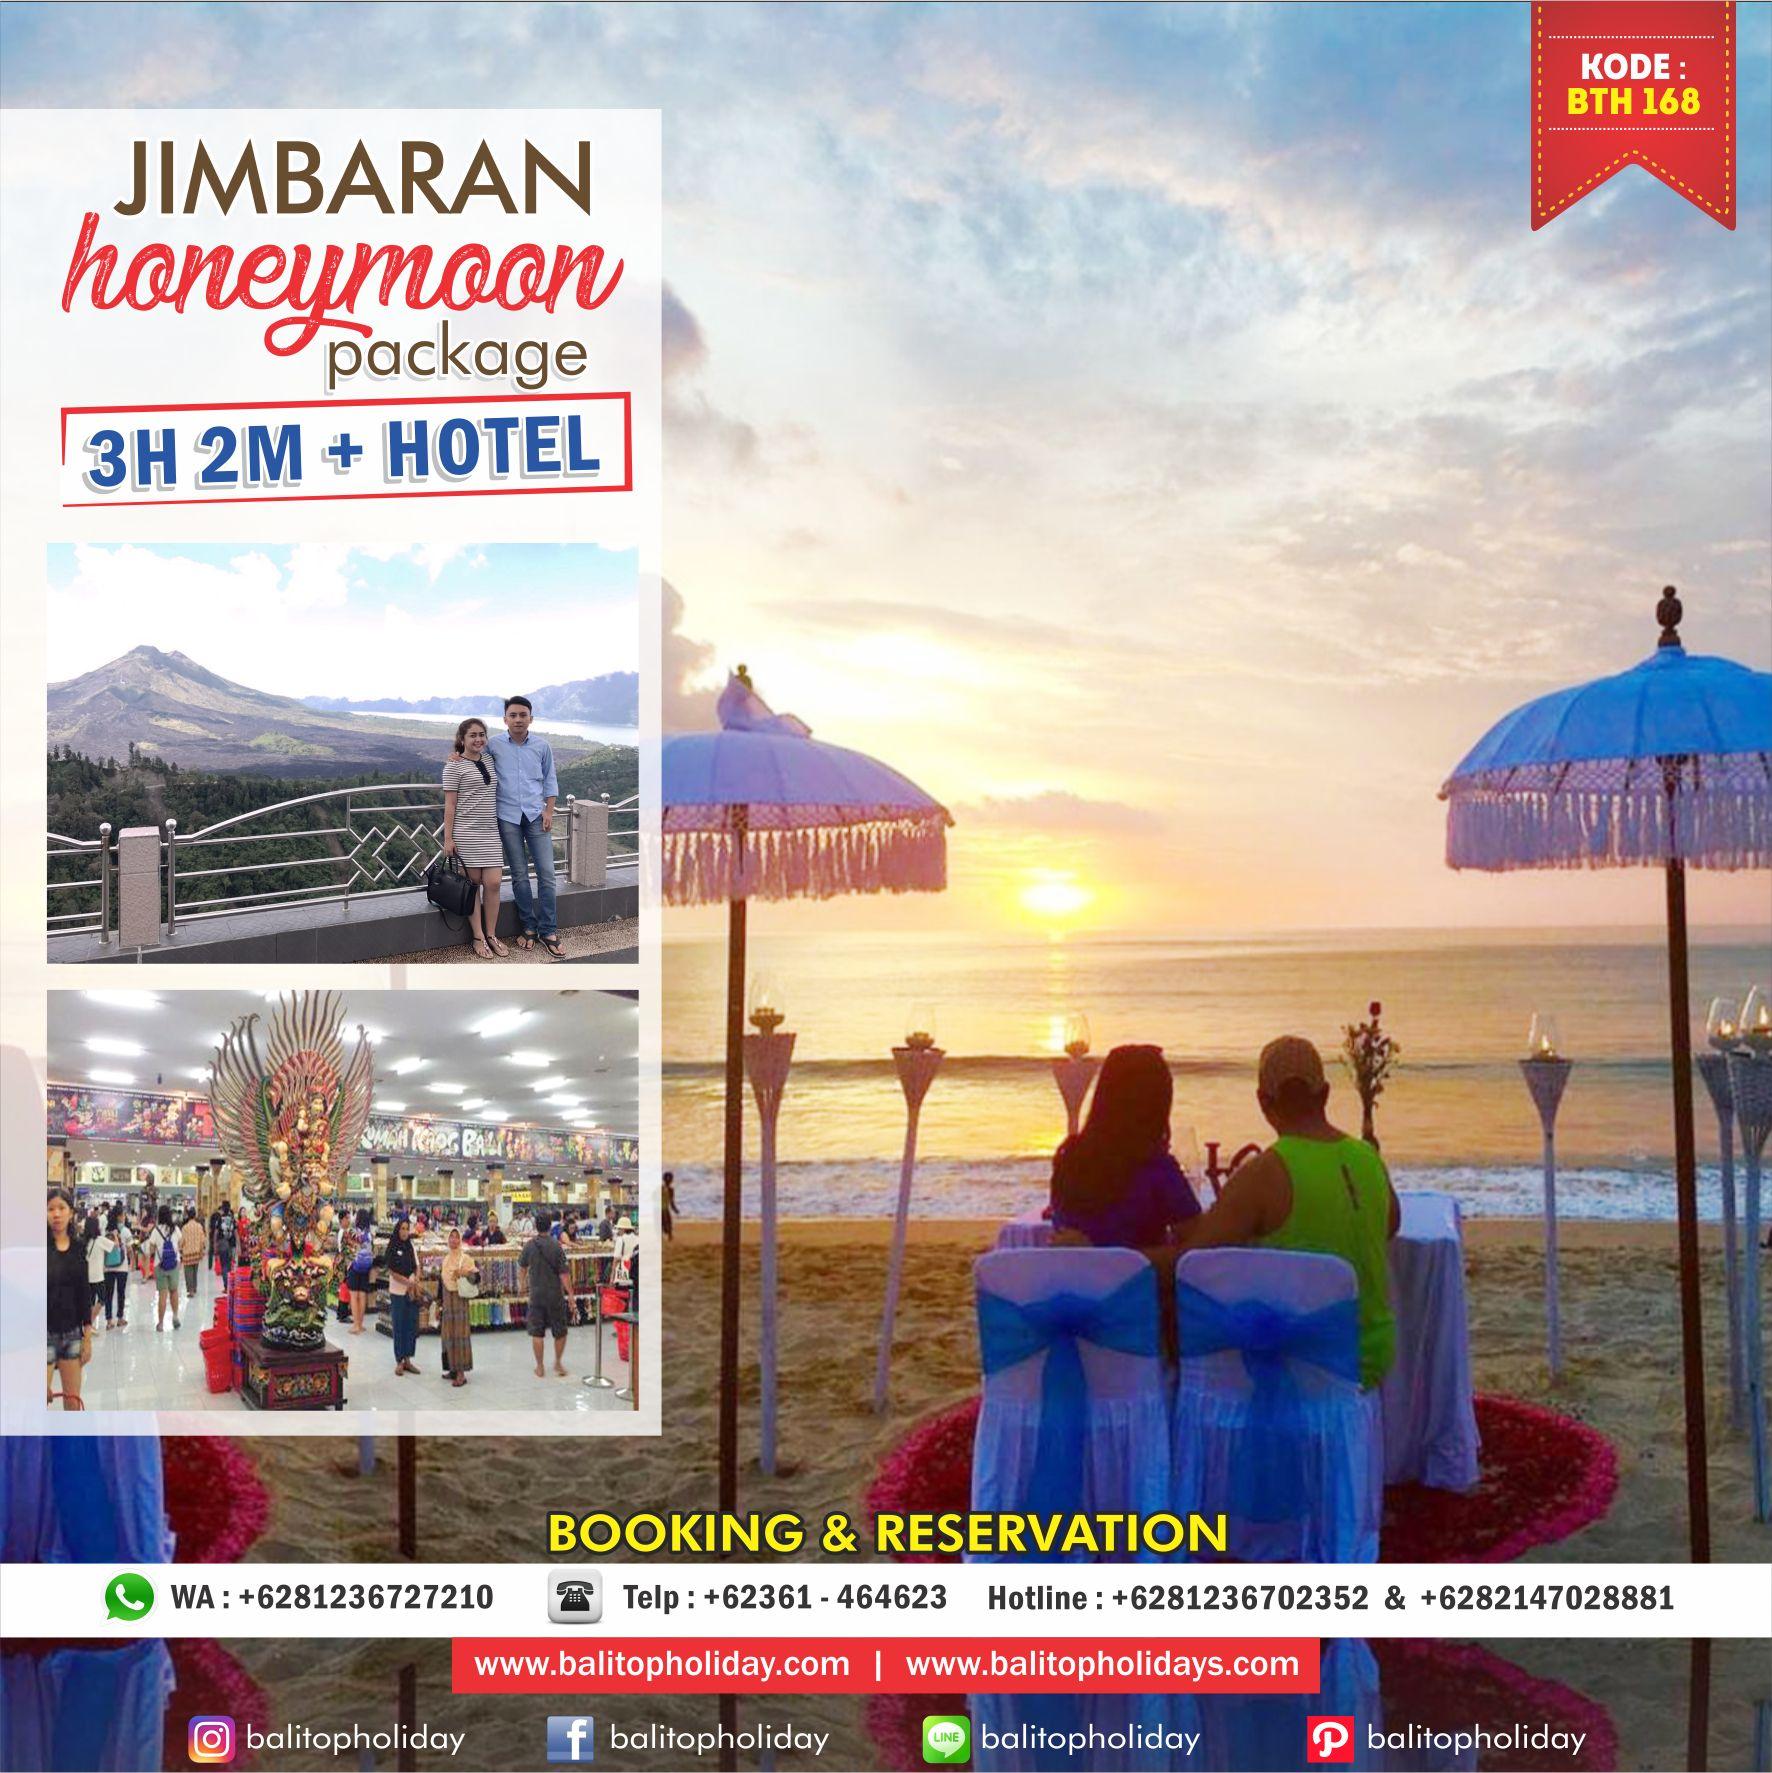 promo honeymoon jimbaran BTH